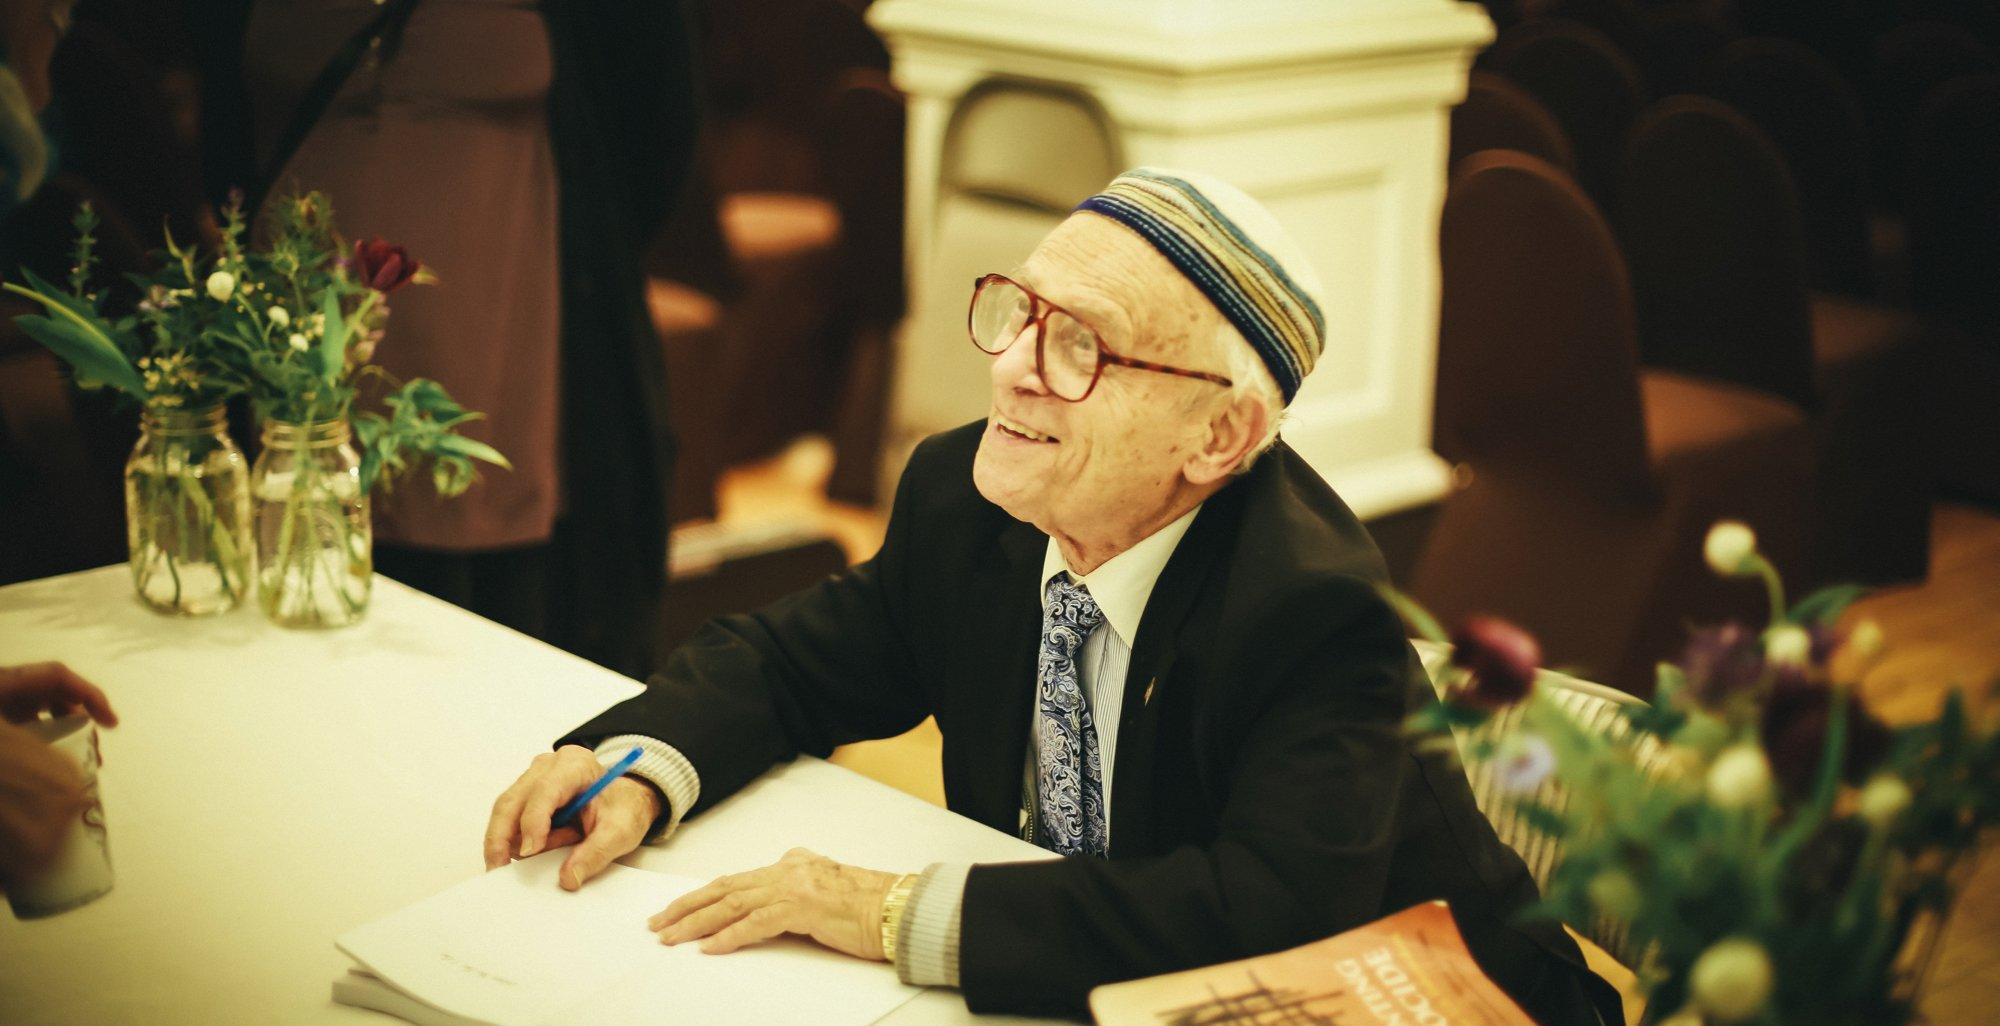 Jewish Legacy Societ